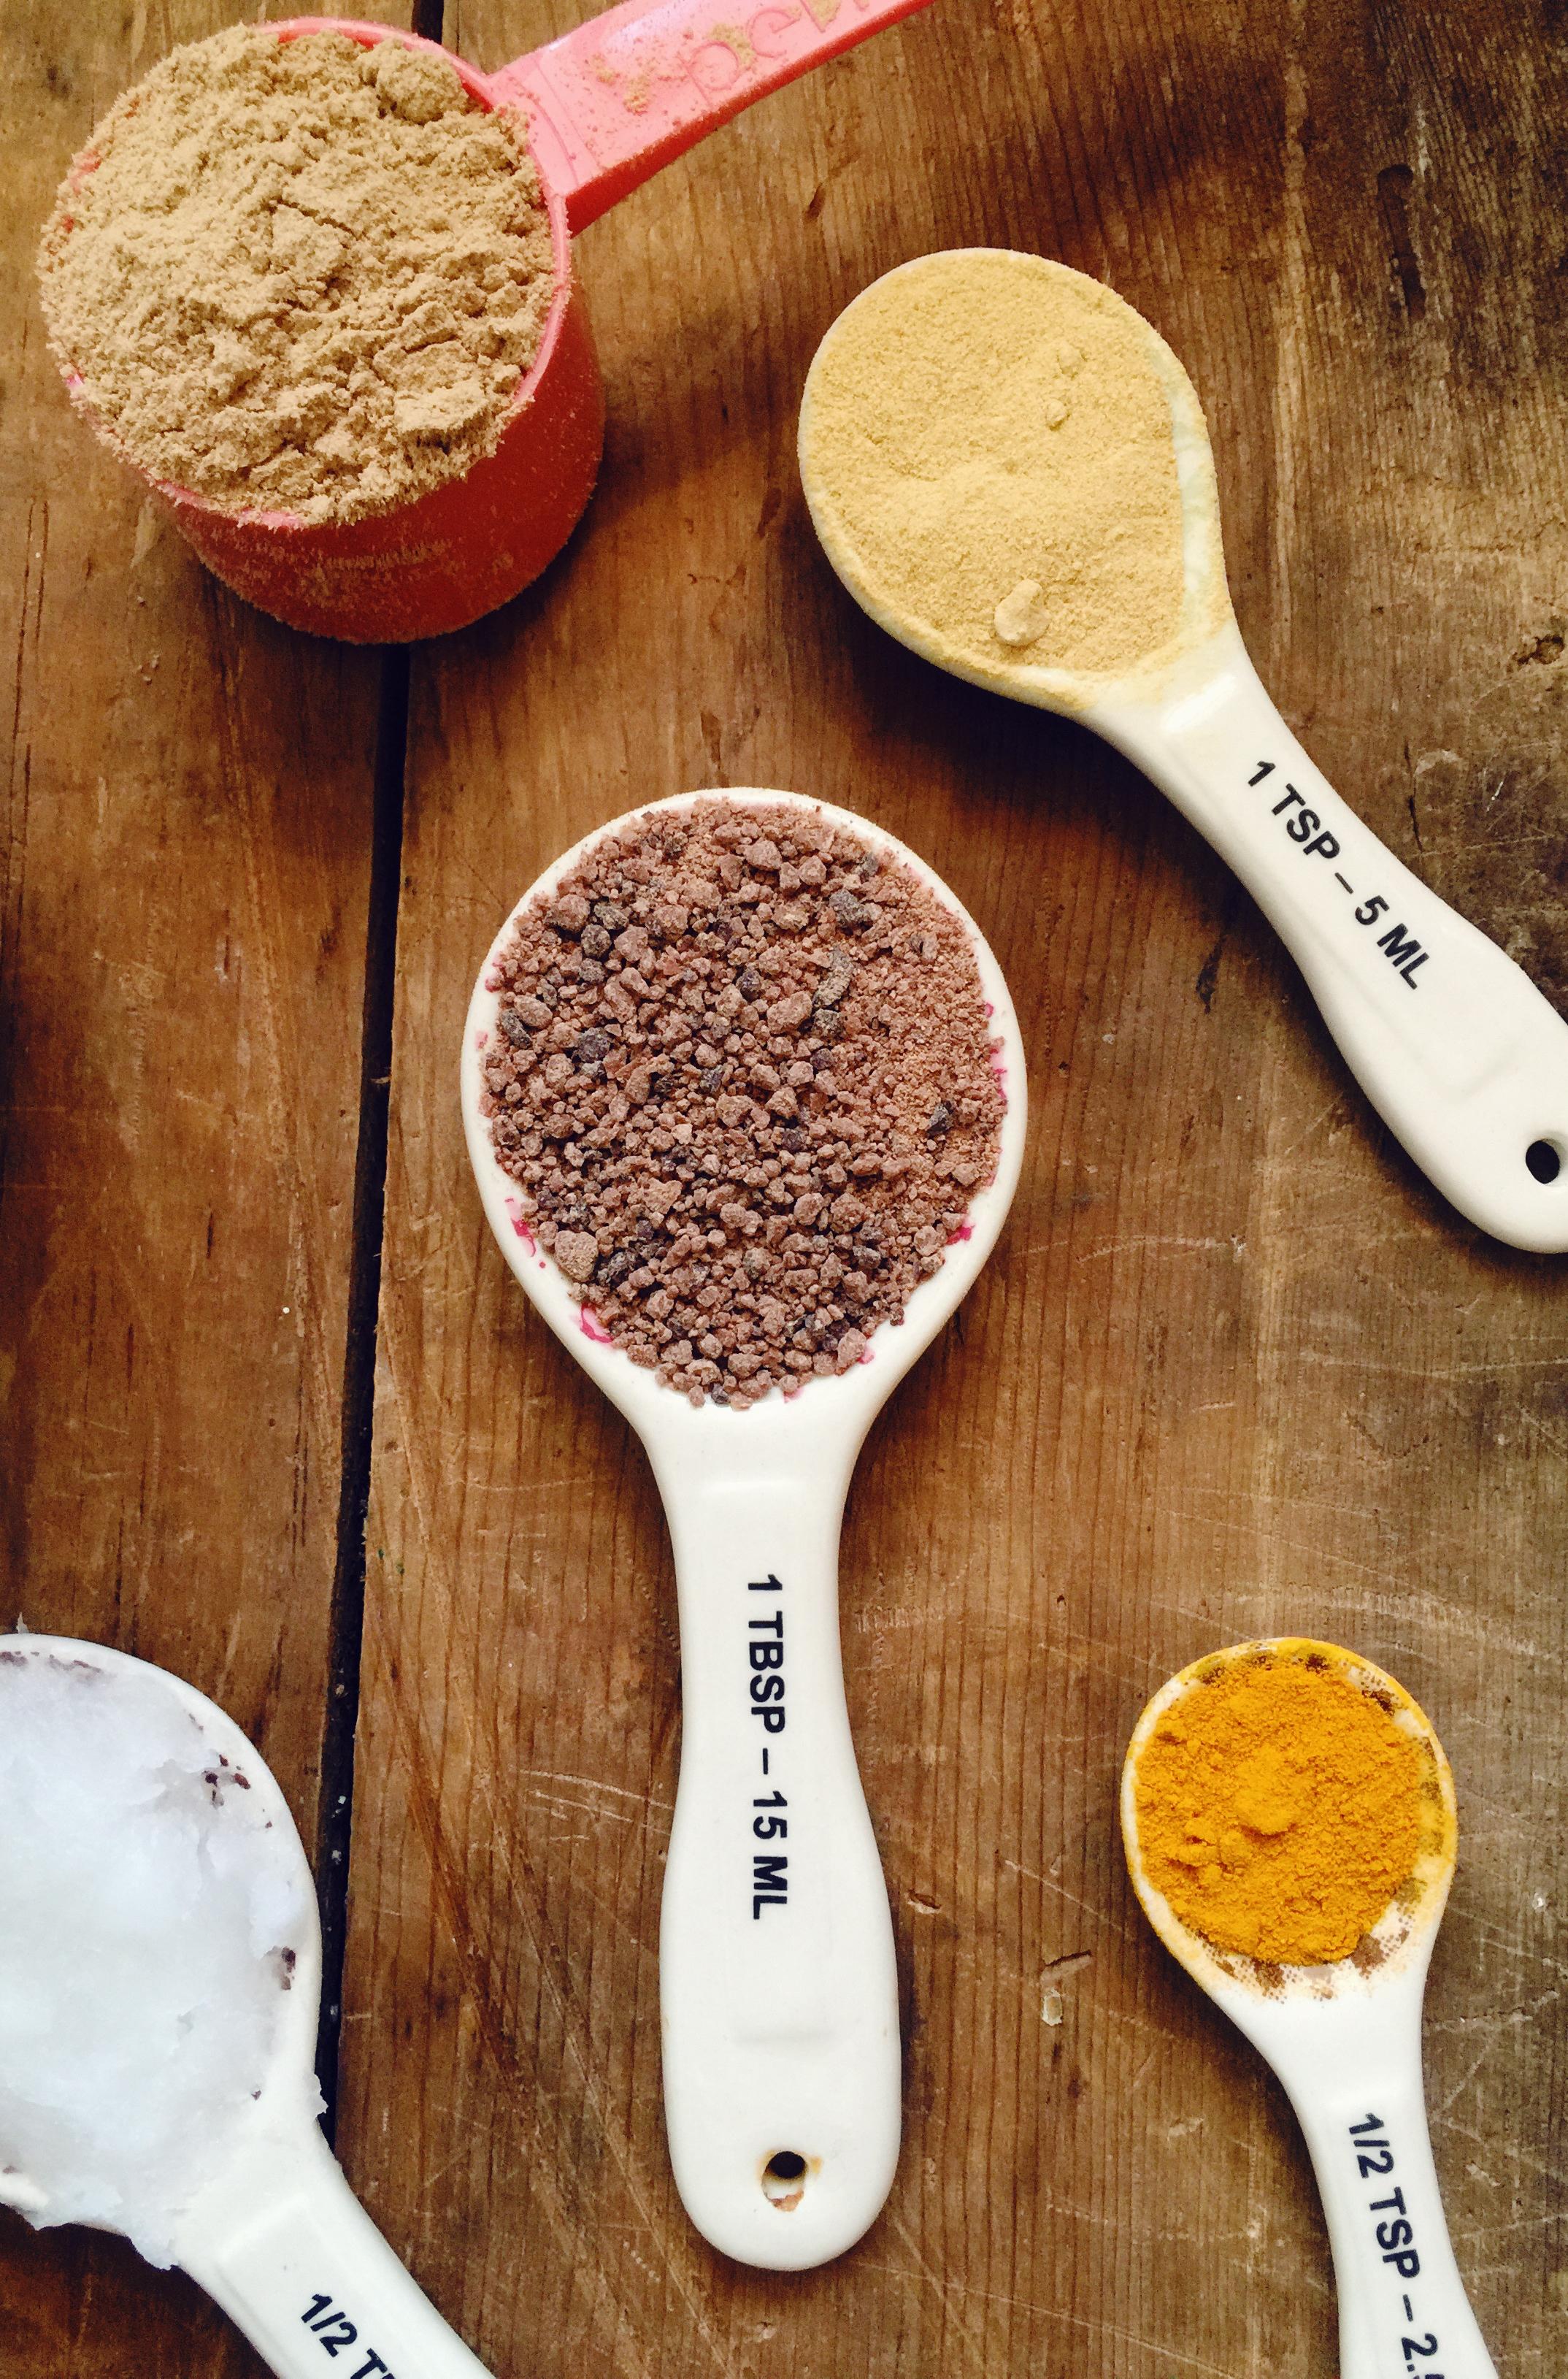 Superfood hot chocolate ingredients